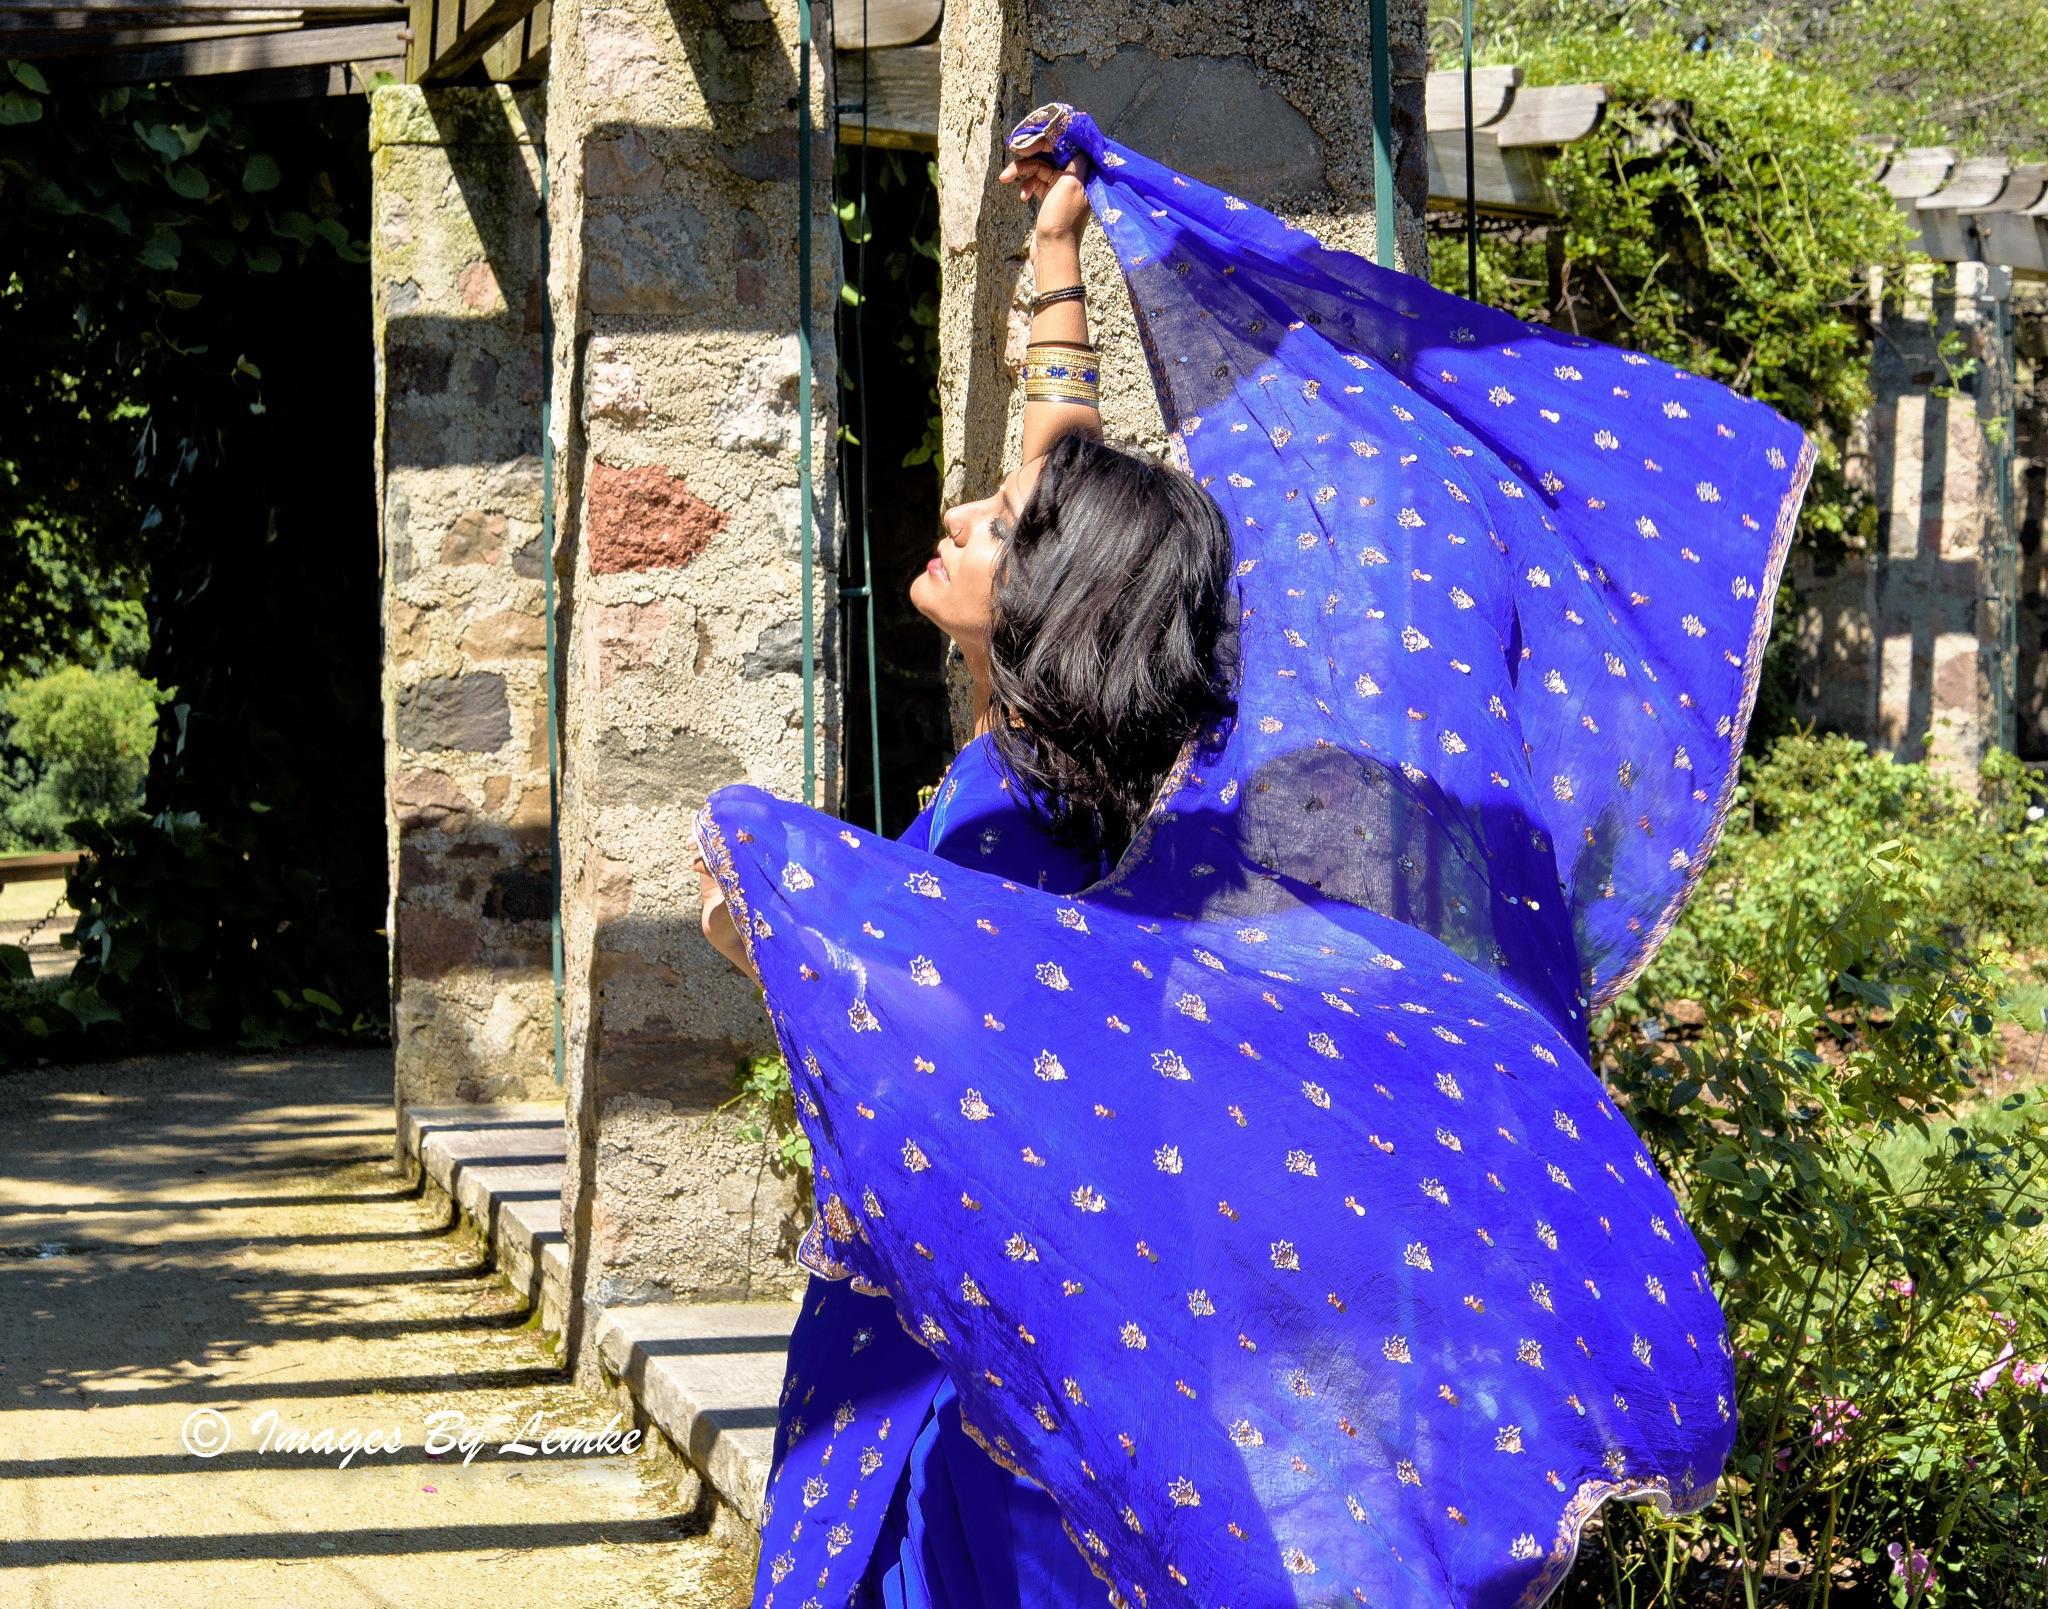 Free Spirit, Indian Bride 2 by ImagesByLemke